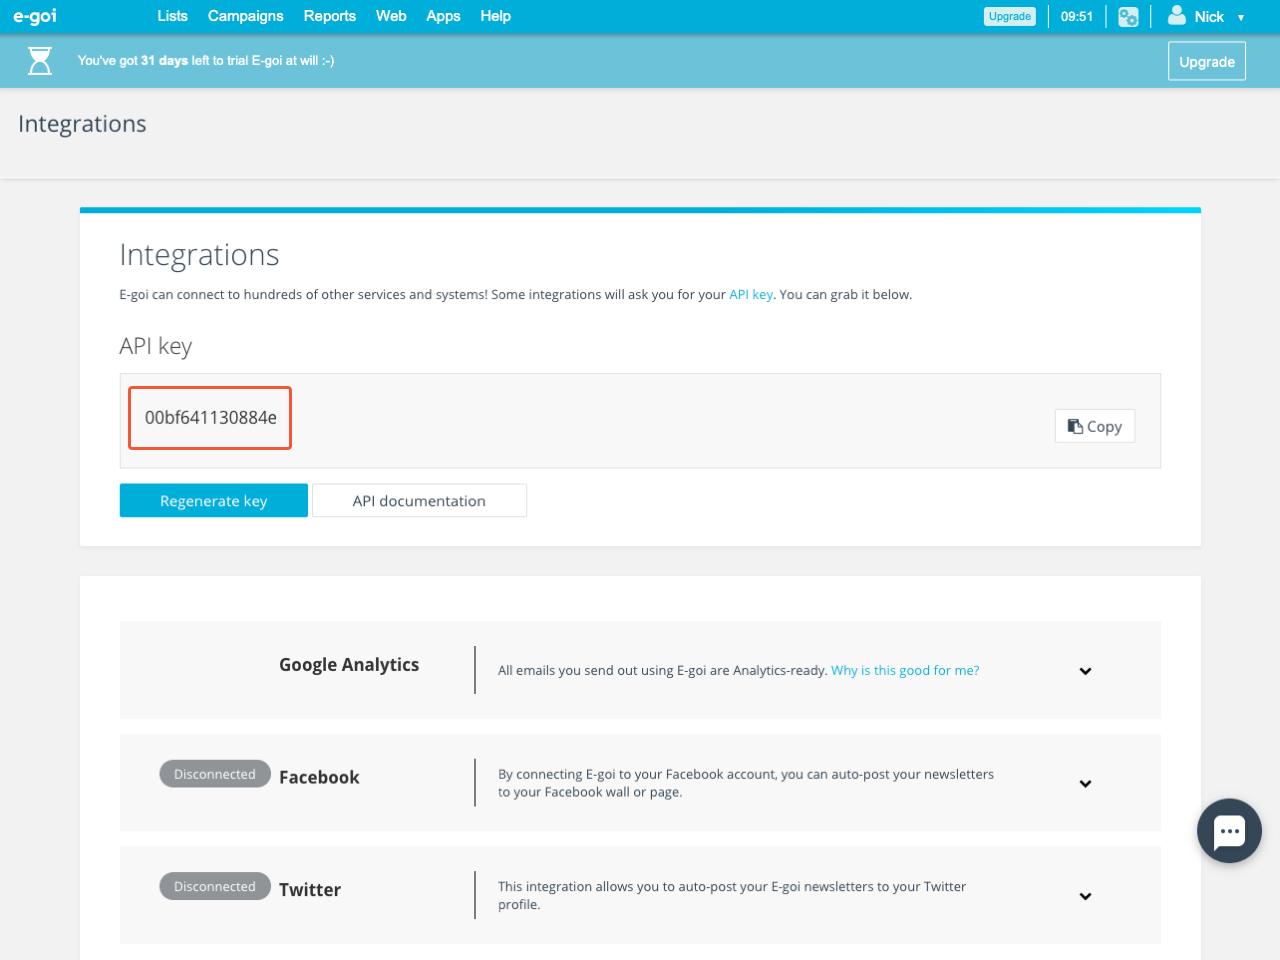 E-goi API key in the Integrations section